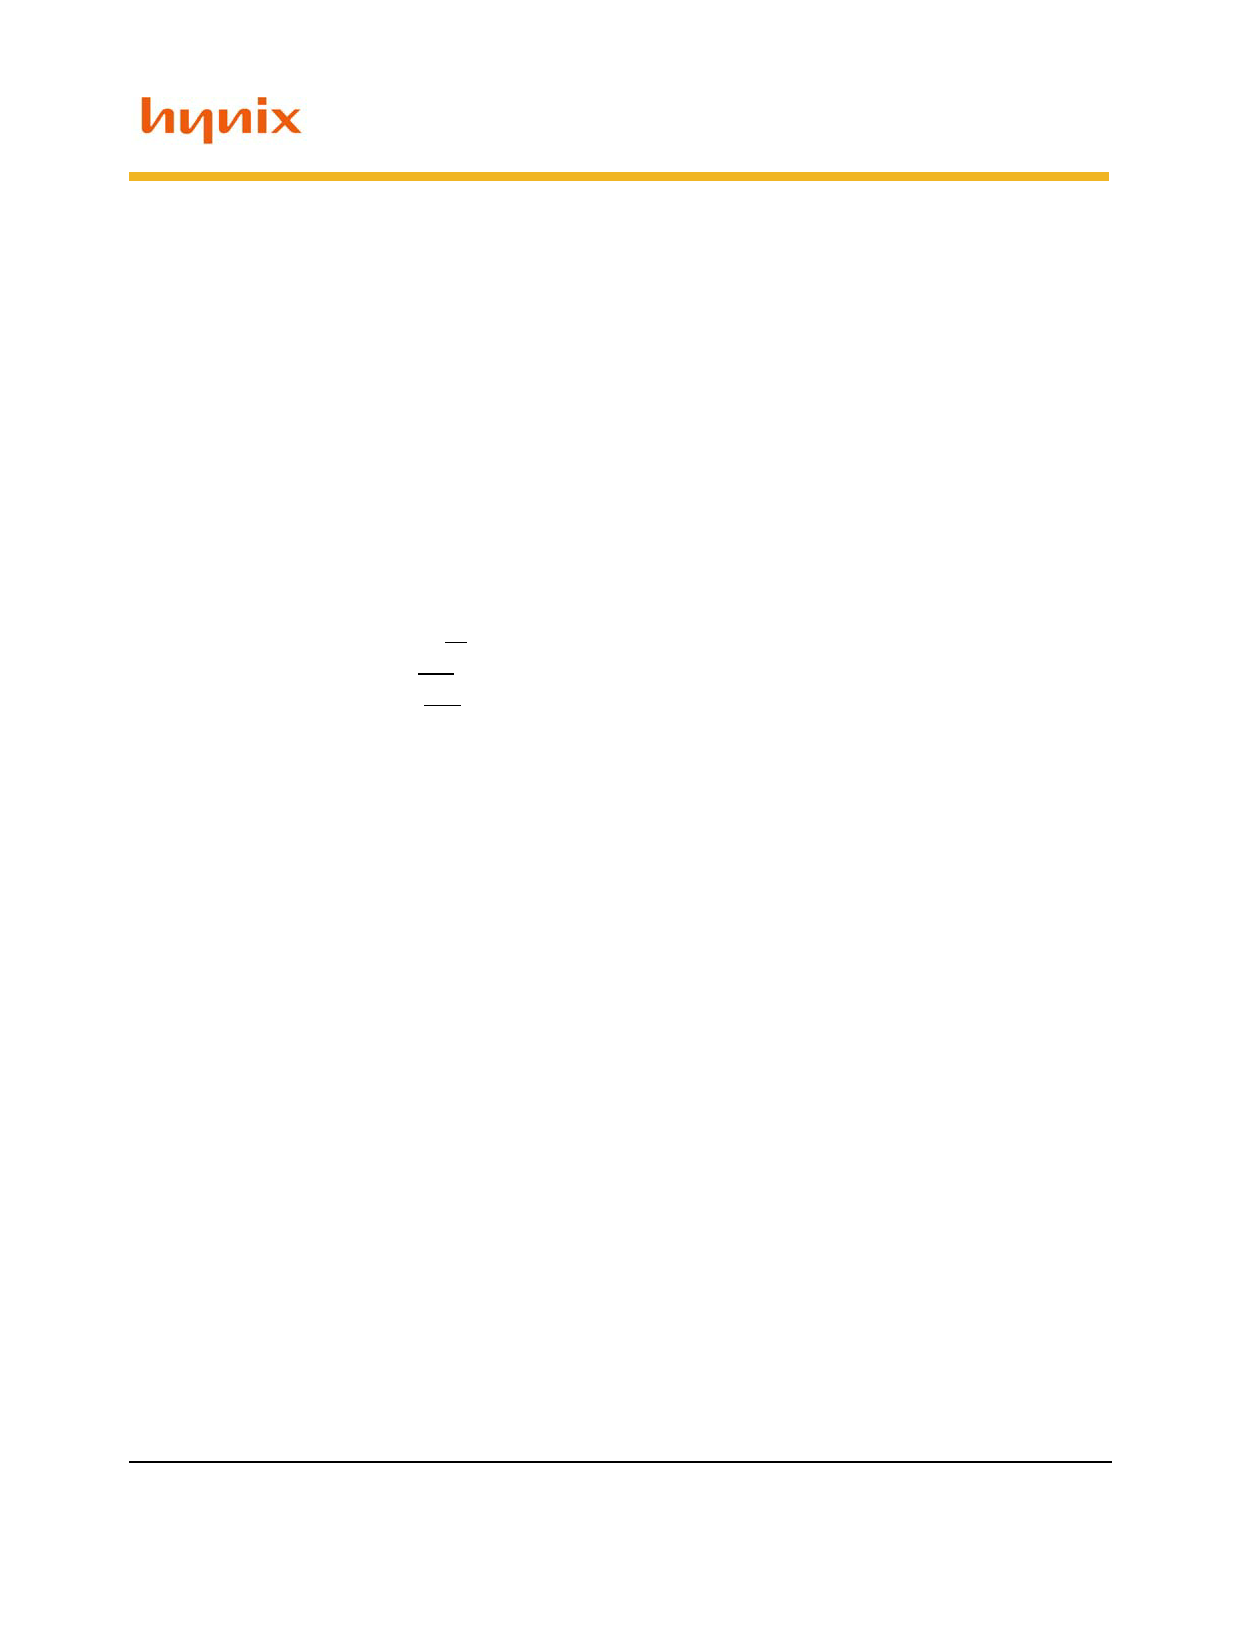 H5TQ4G83MFR-xxC Даташит, Описание, Даташиты